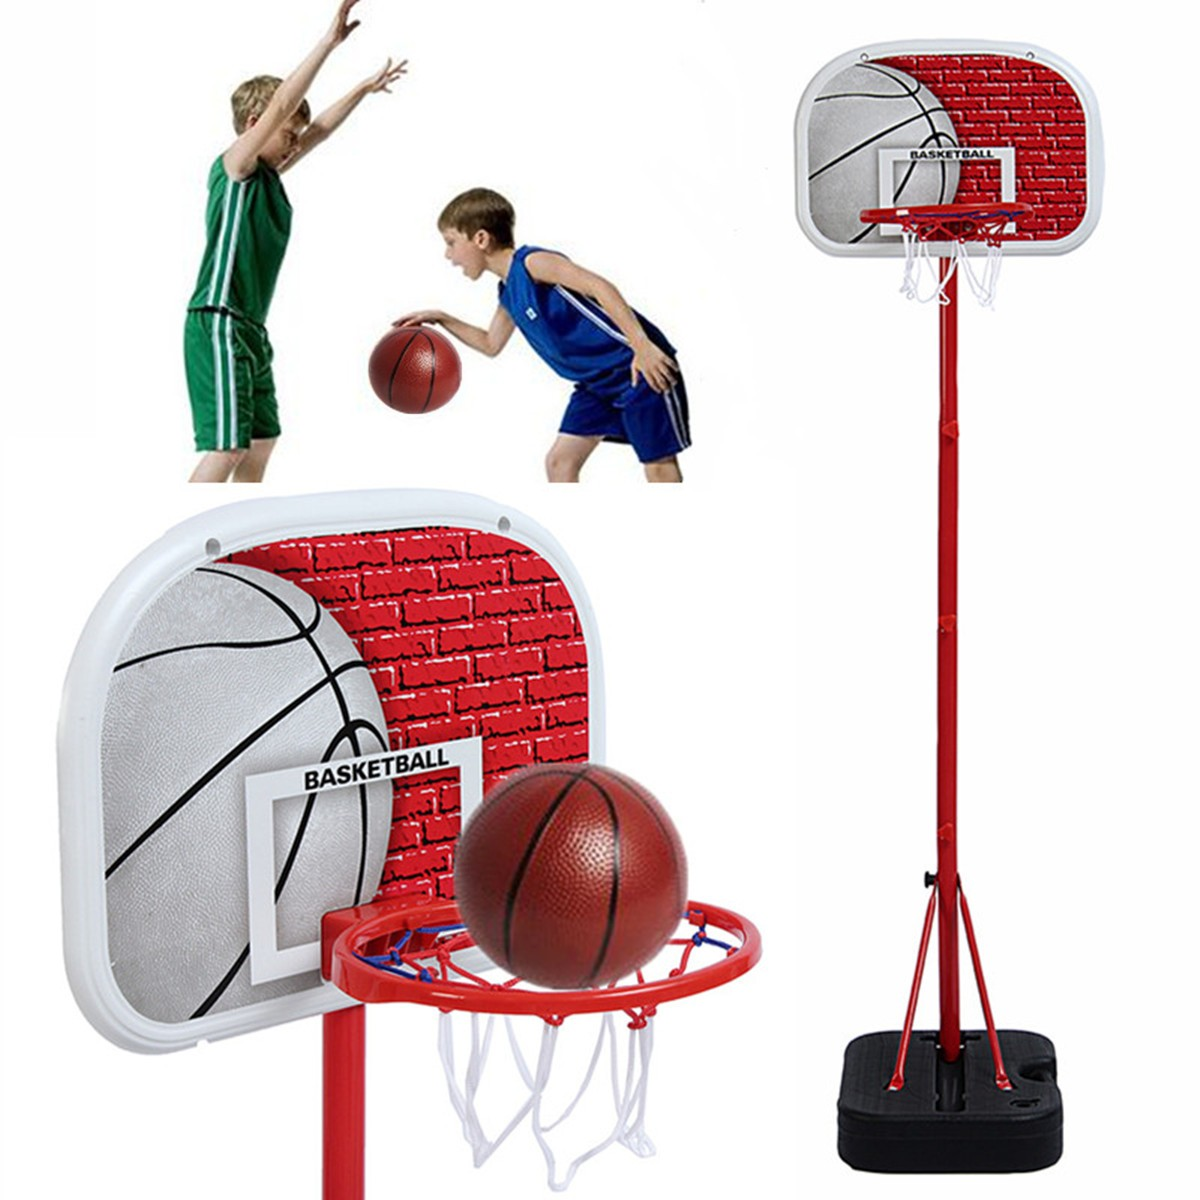 Portable Basketball Hoop For Kids Hoop & Backboard